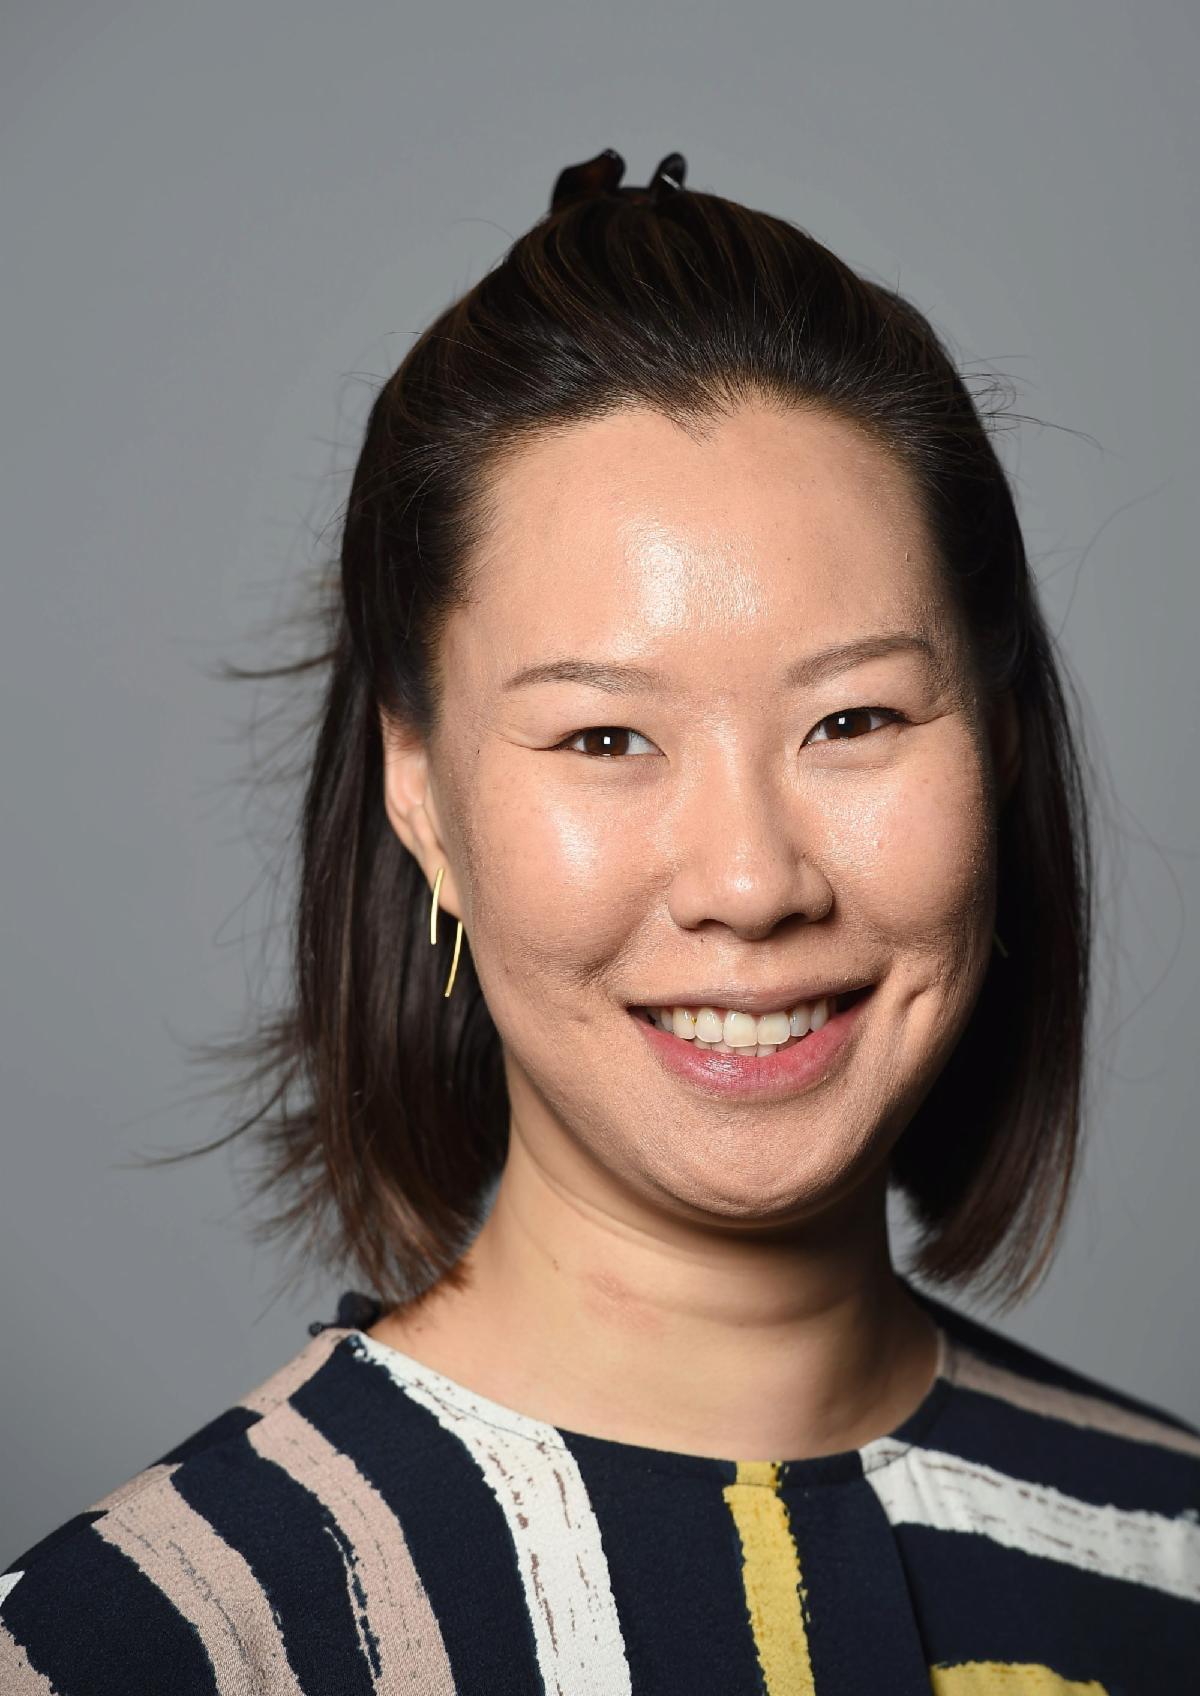 Kristen Ming